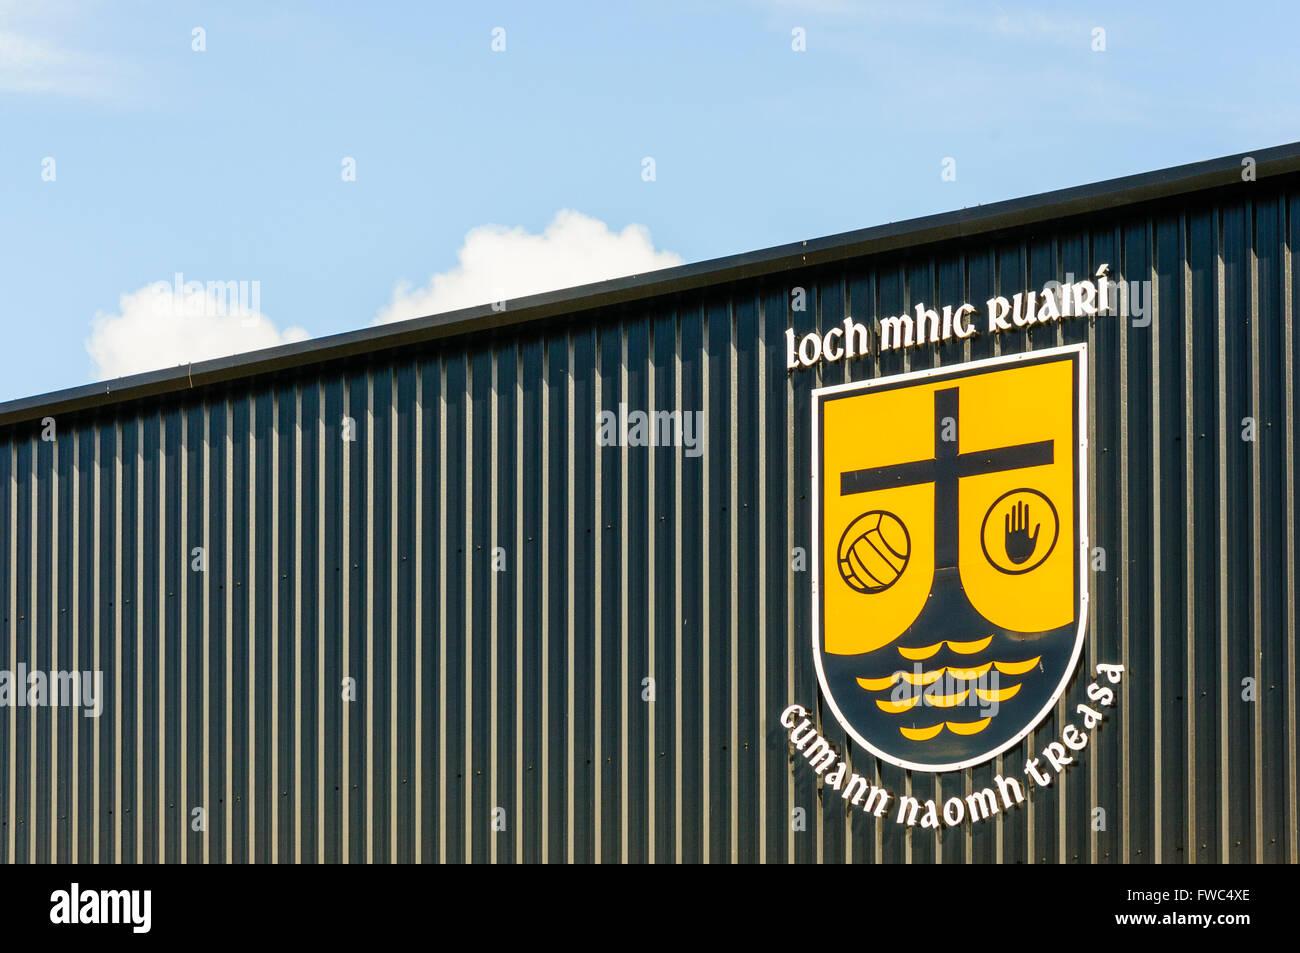 Loch mhic Raurí GAA grounds, Loughmacrory, County Tyrone, Northern Ireland. Stock Photo